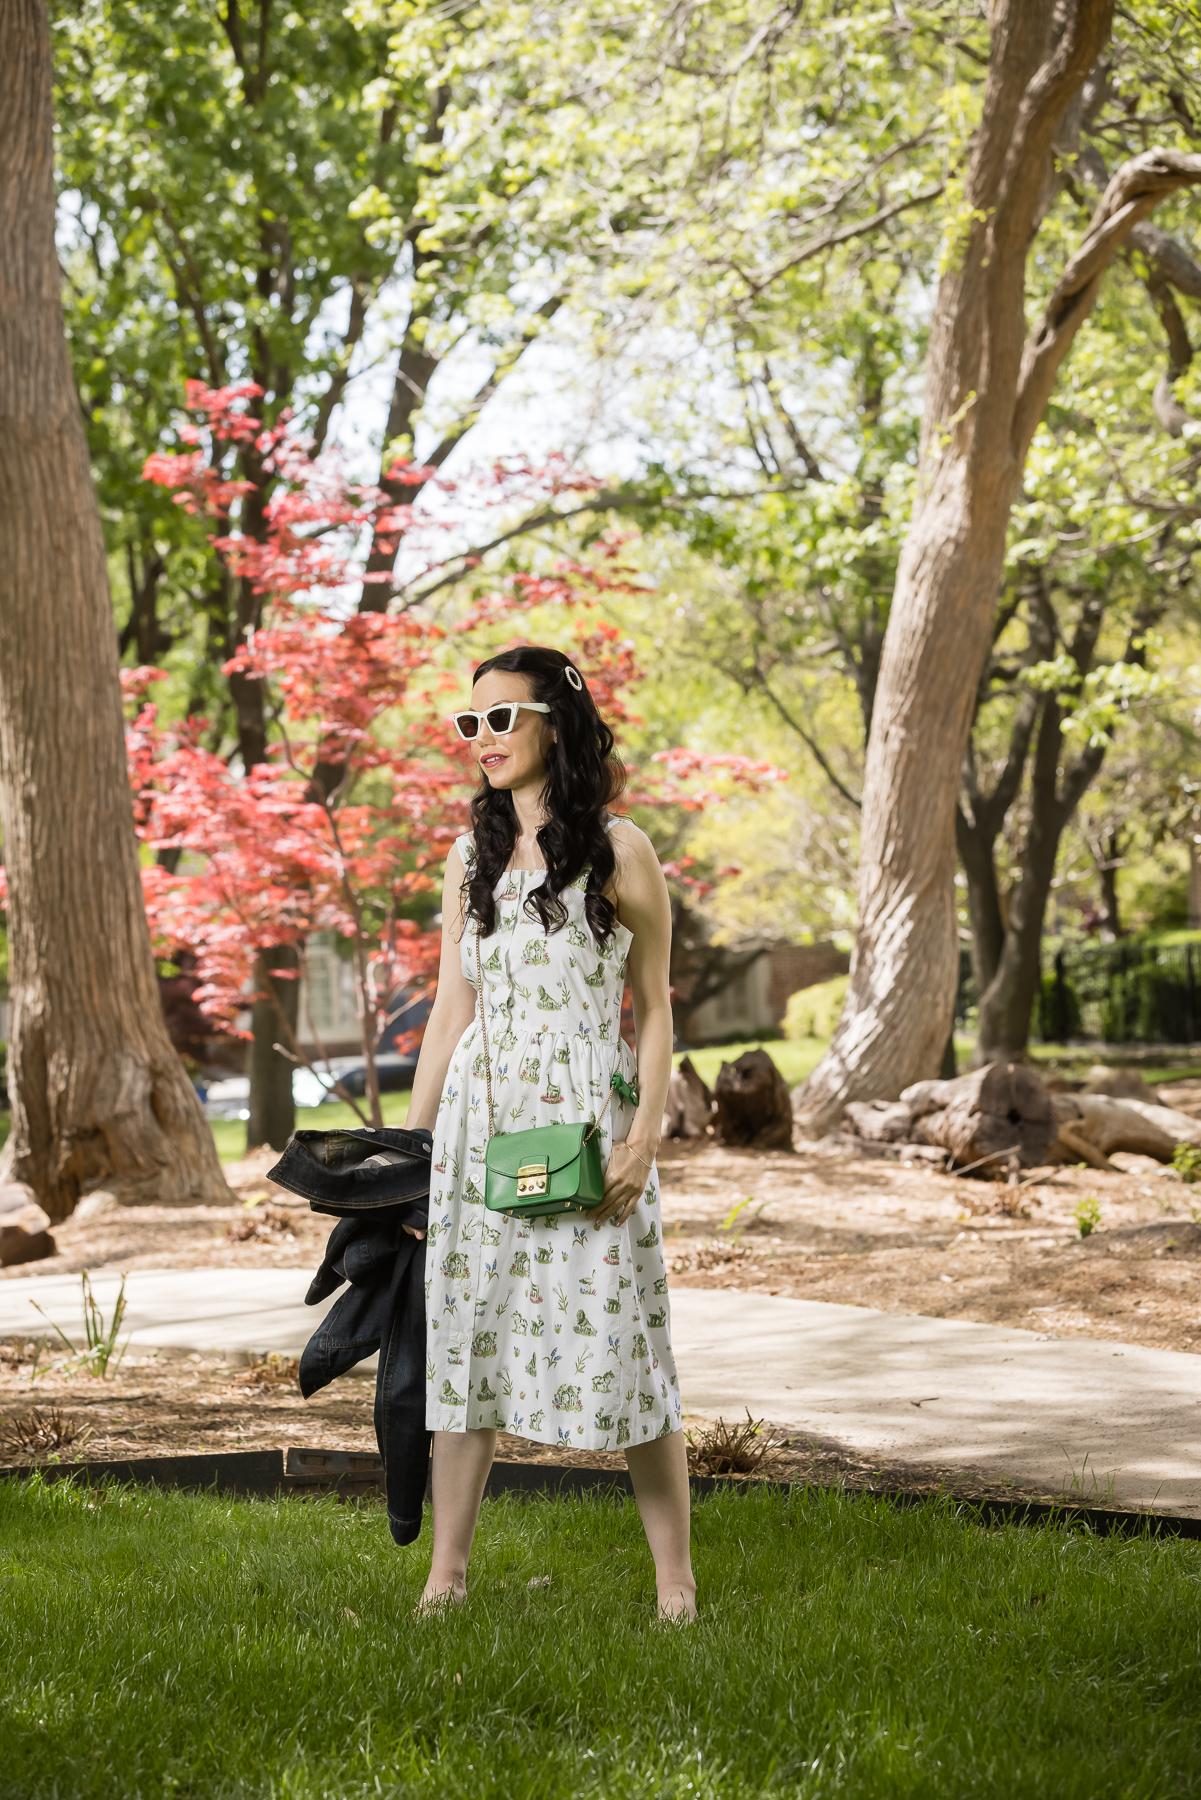 Sarah Patrick Collection Newport Topiary Gardens Dress, Italic Cateye Sunglasses, Green Mini Furla Crossbody Bag